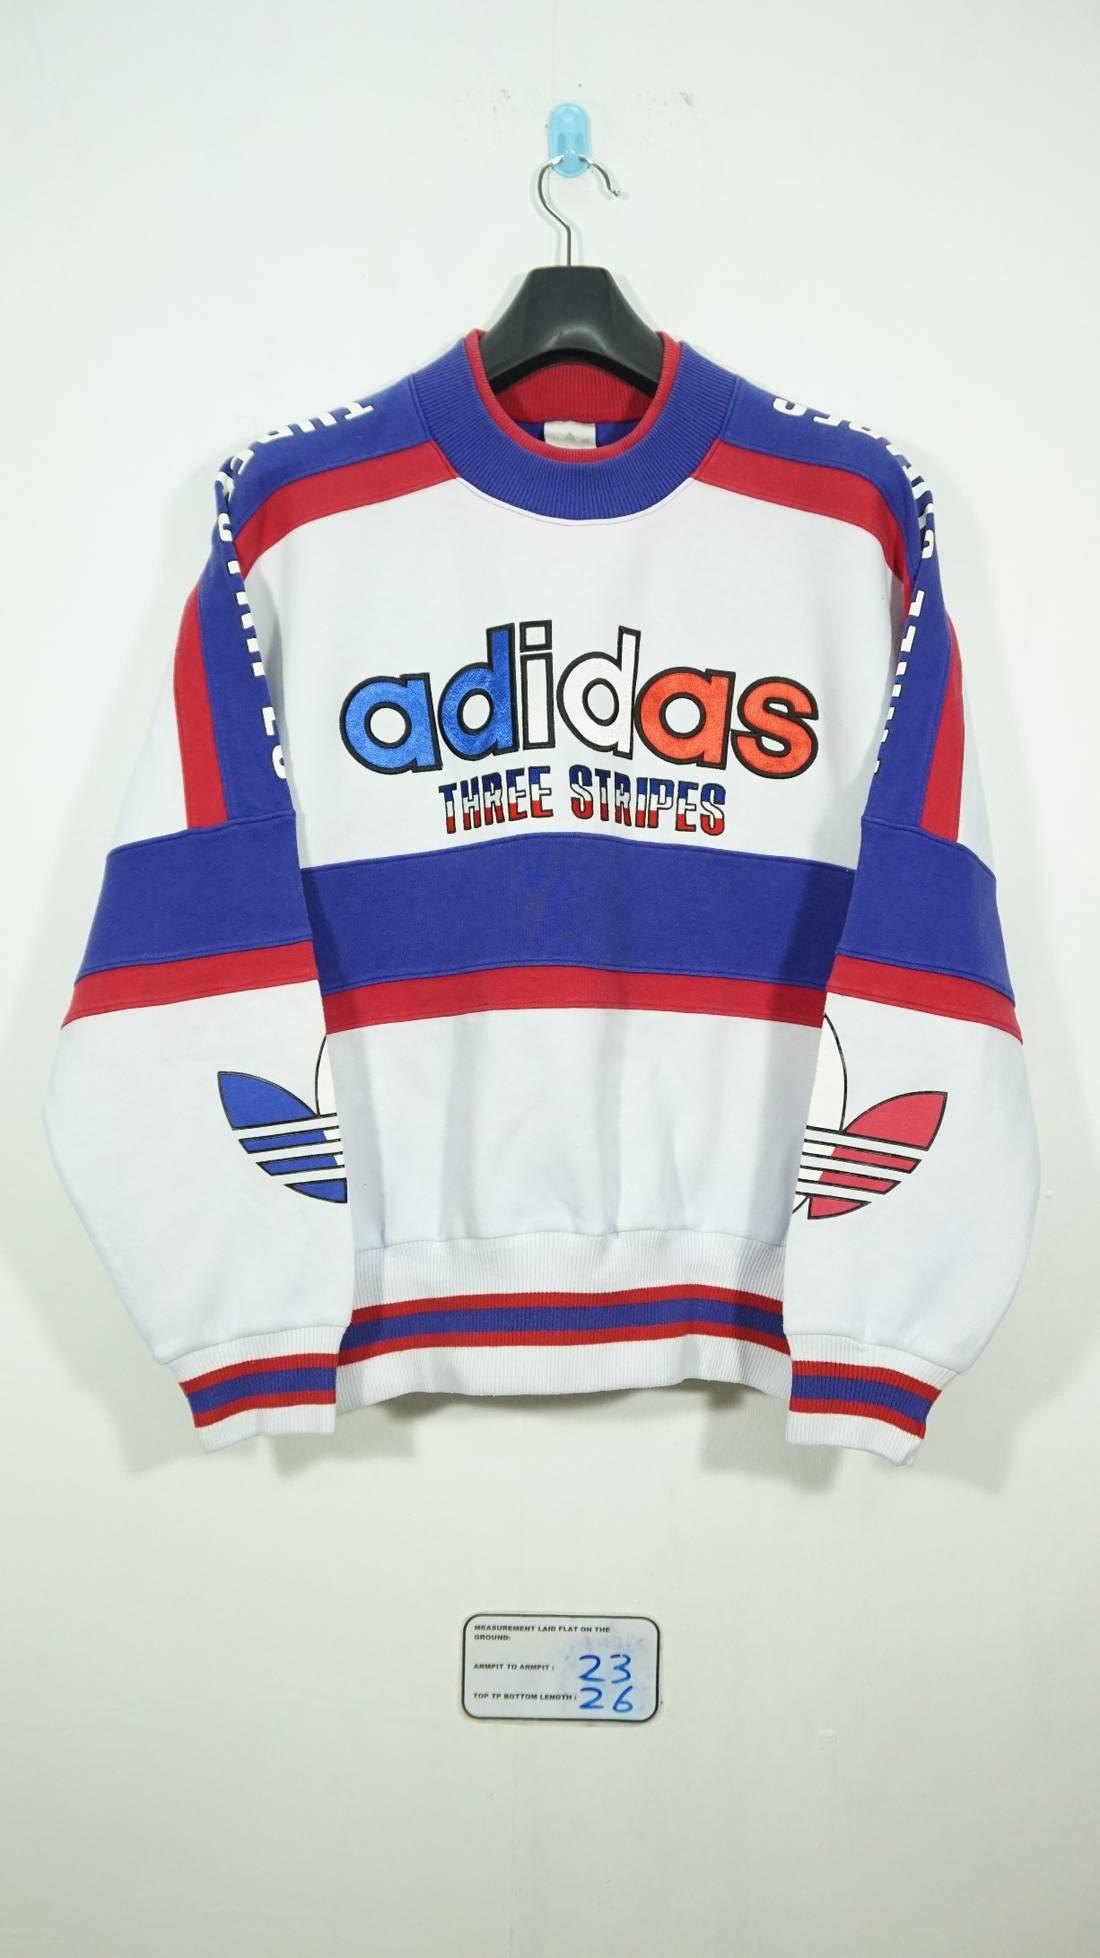 Adidas 6997 Vintage Adidas Multi Color Adidas Big Logo Trefoil Color Sweater Run Dmc 1358126 - itorrent.site